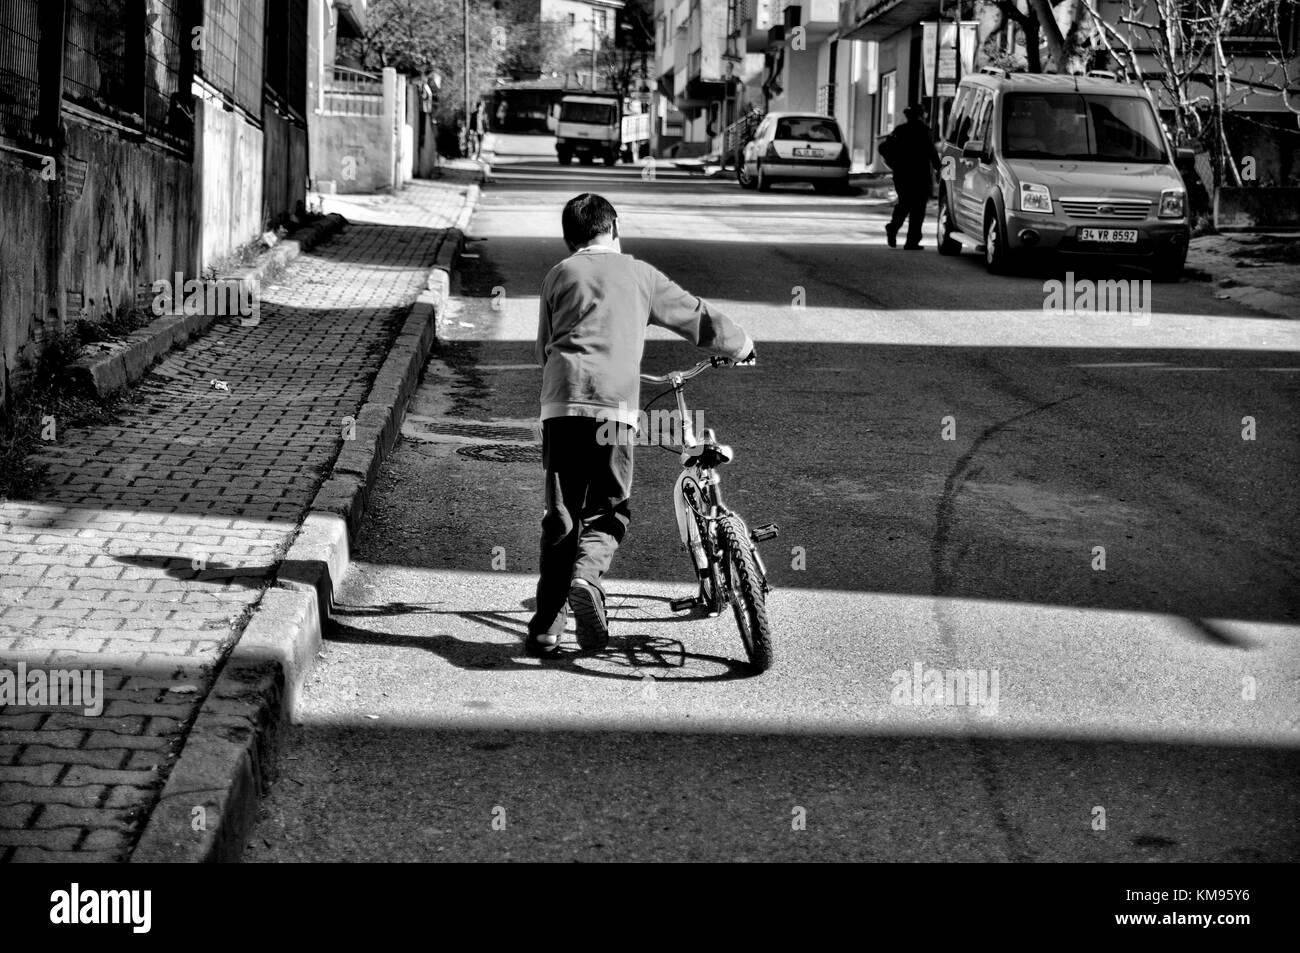 child, street, bike, hope, justice - Stock Image